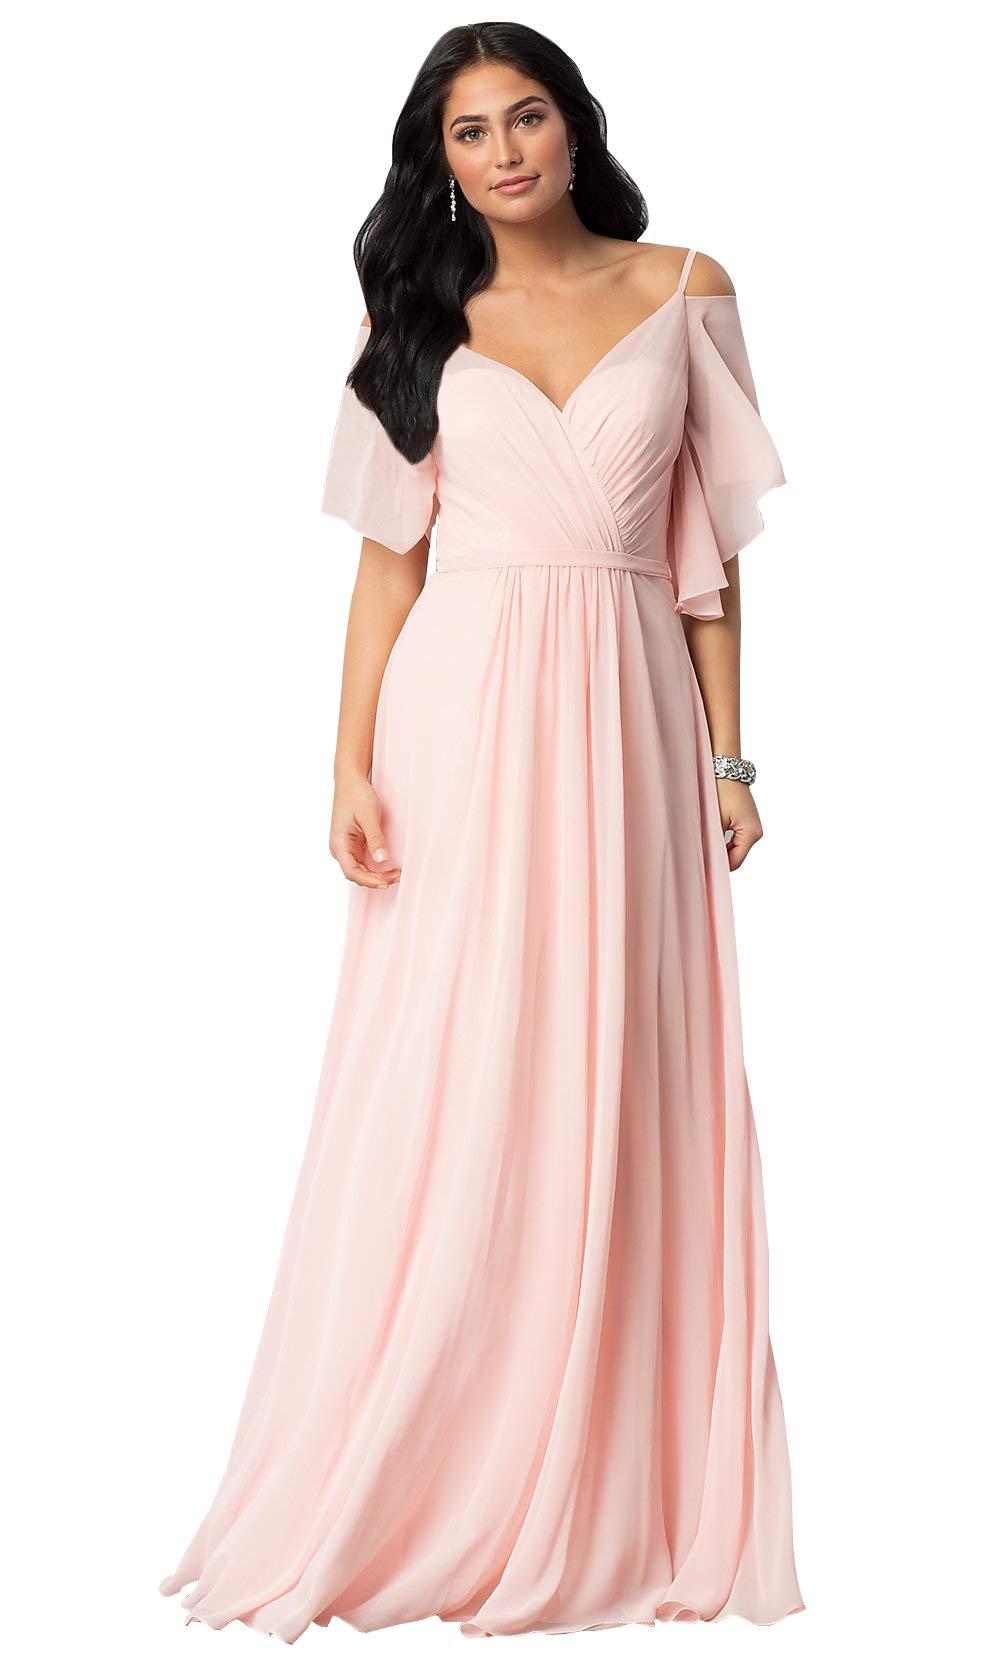 KKarine Flutter Sleeves Spaghetti Strap V Neck Bridesmaid Dress Long  Evening Gown Plus Size (18W Blush Pink)